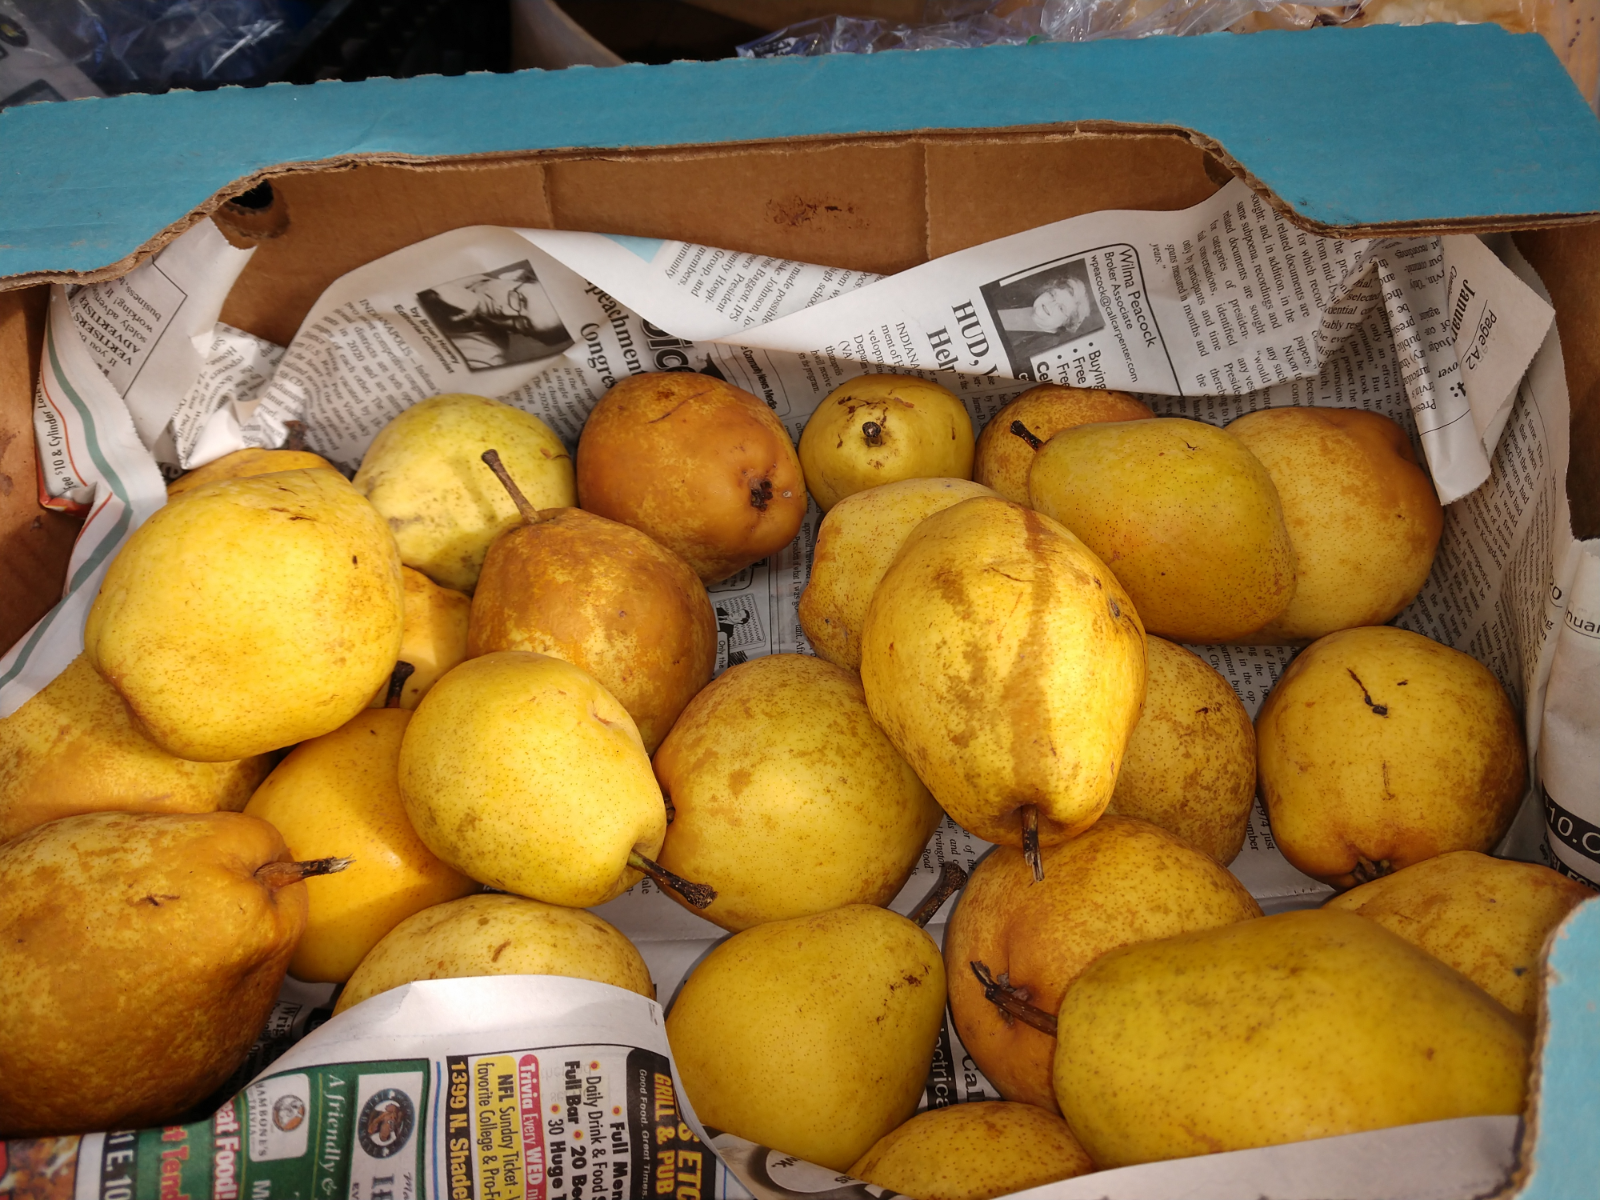 fresh-winter-pears-2nds-3-lbs